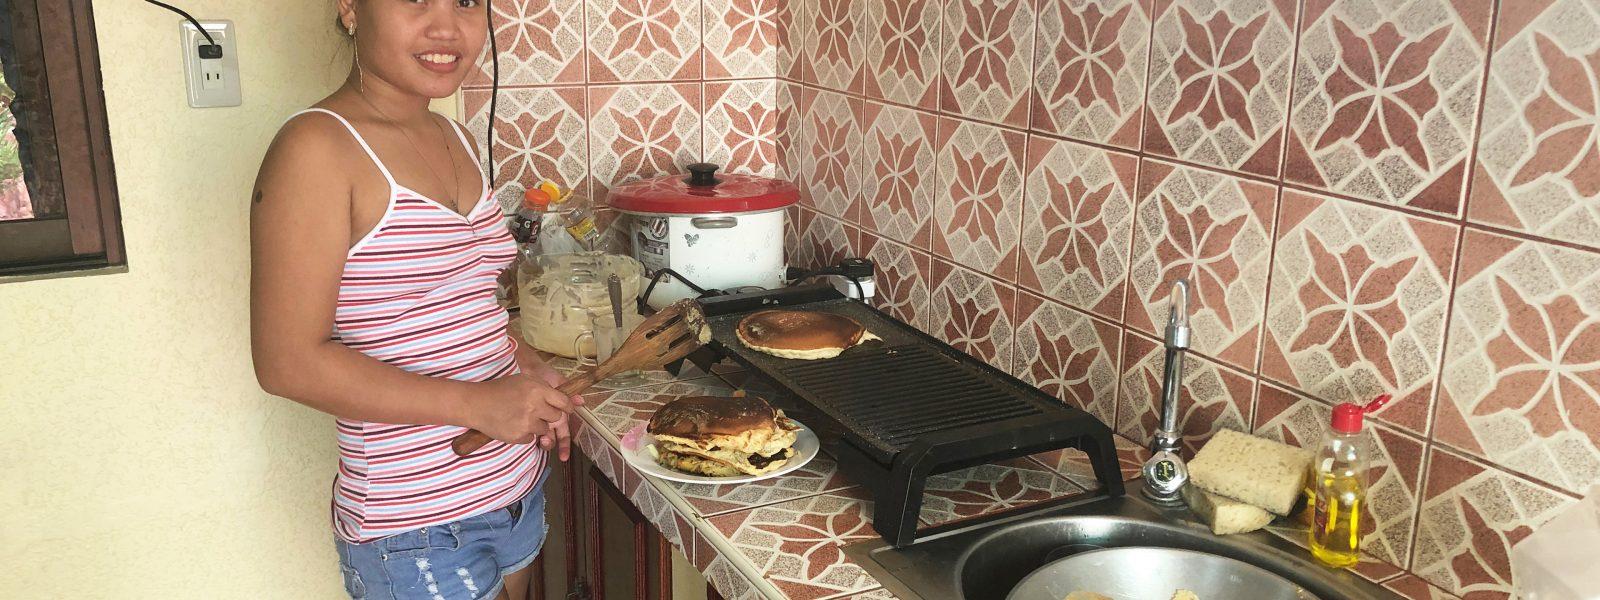 Filipina Wife Burns the Pancakes